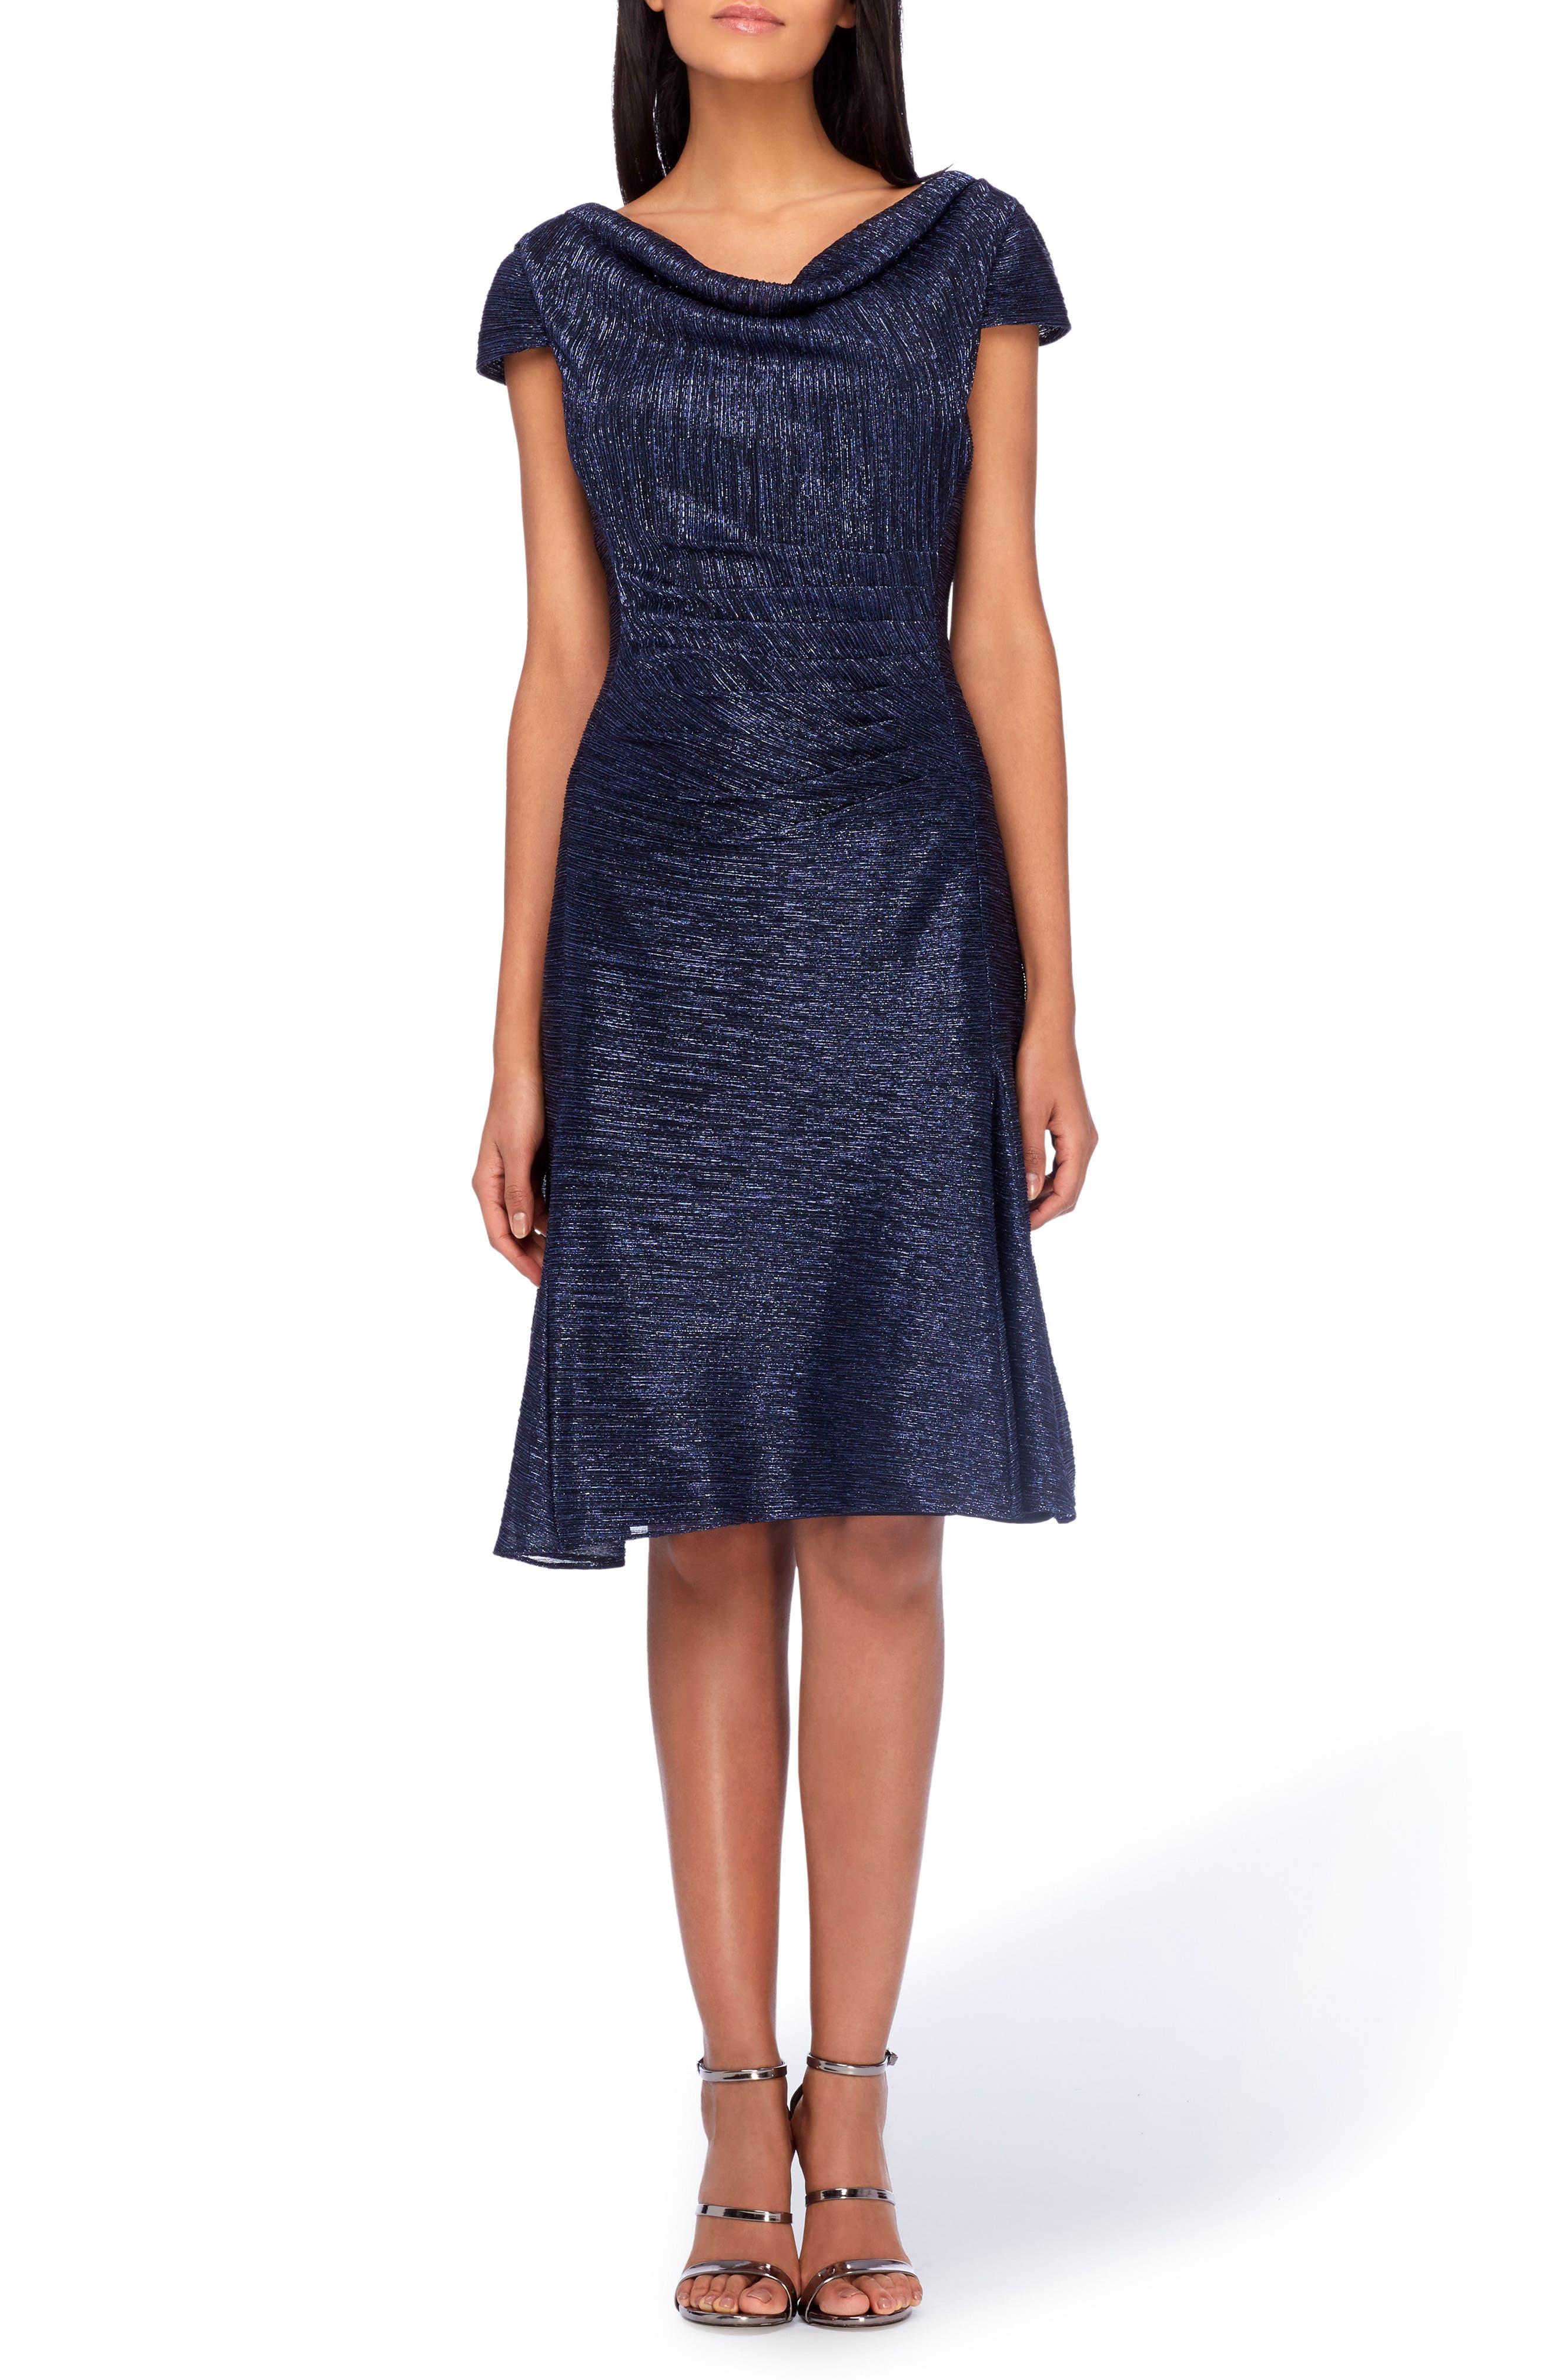 TAHARI,                             Cowl Neck Fit & Flare Dress,                             Main thumbnail 1, color,                             412